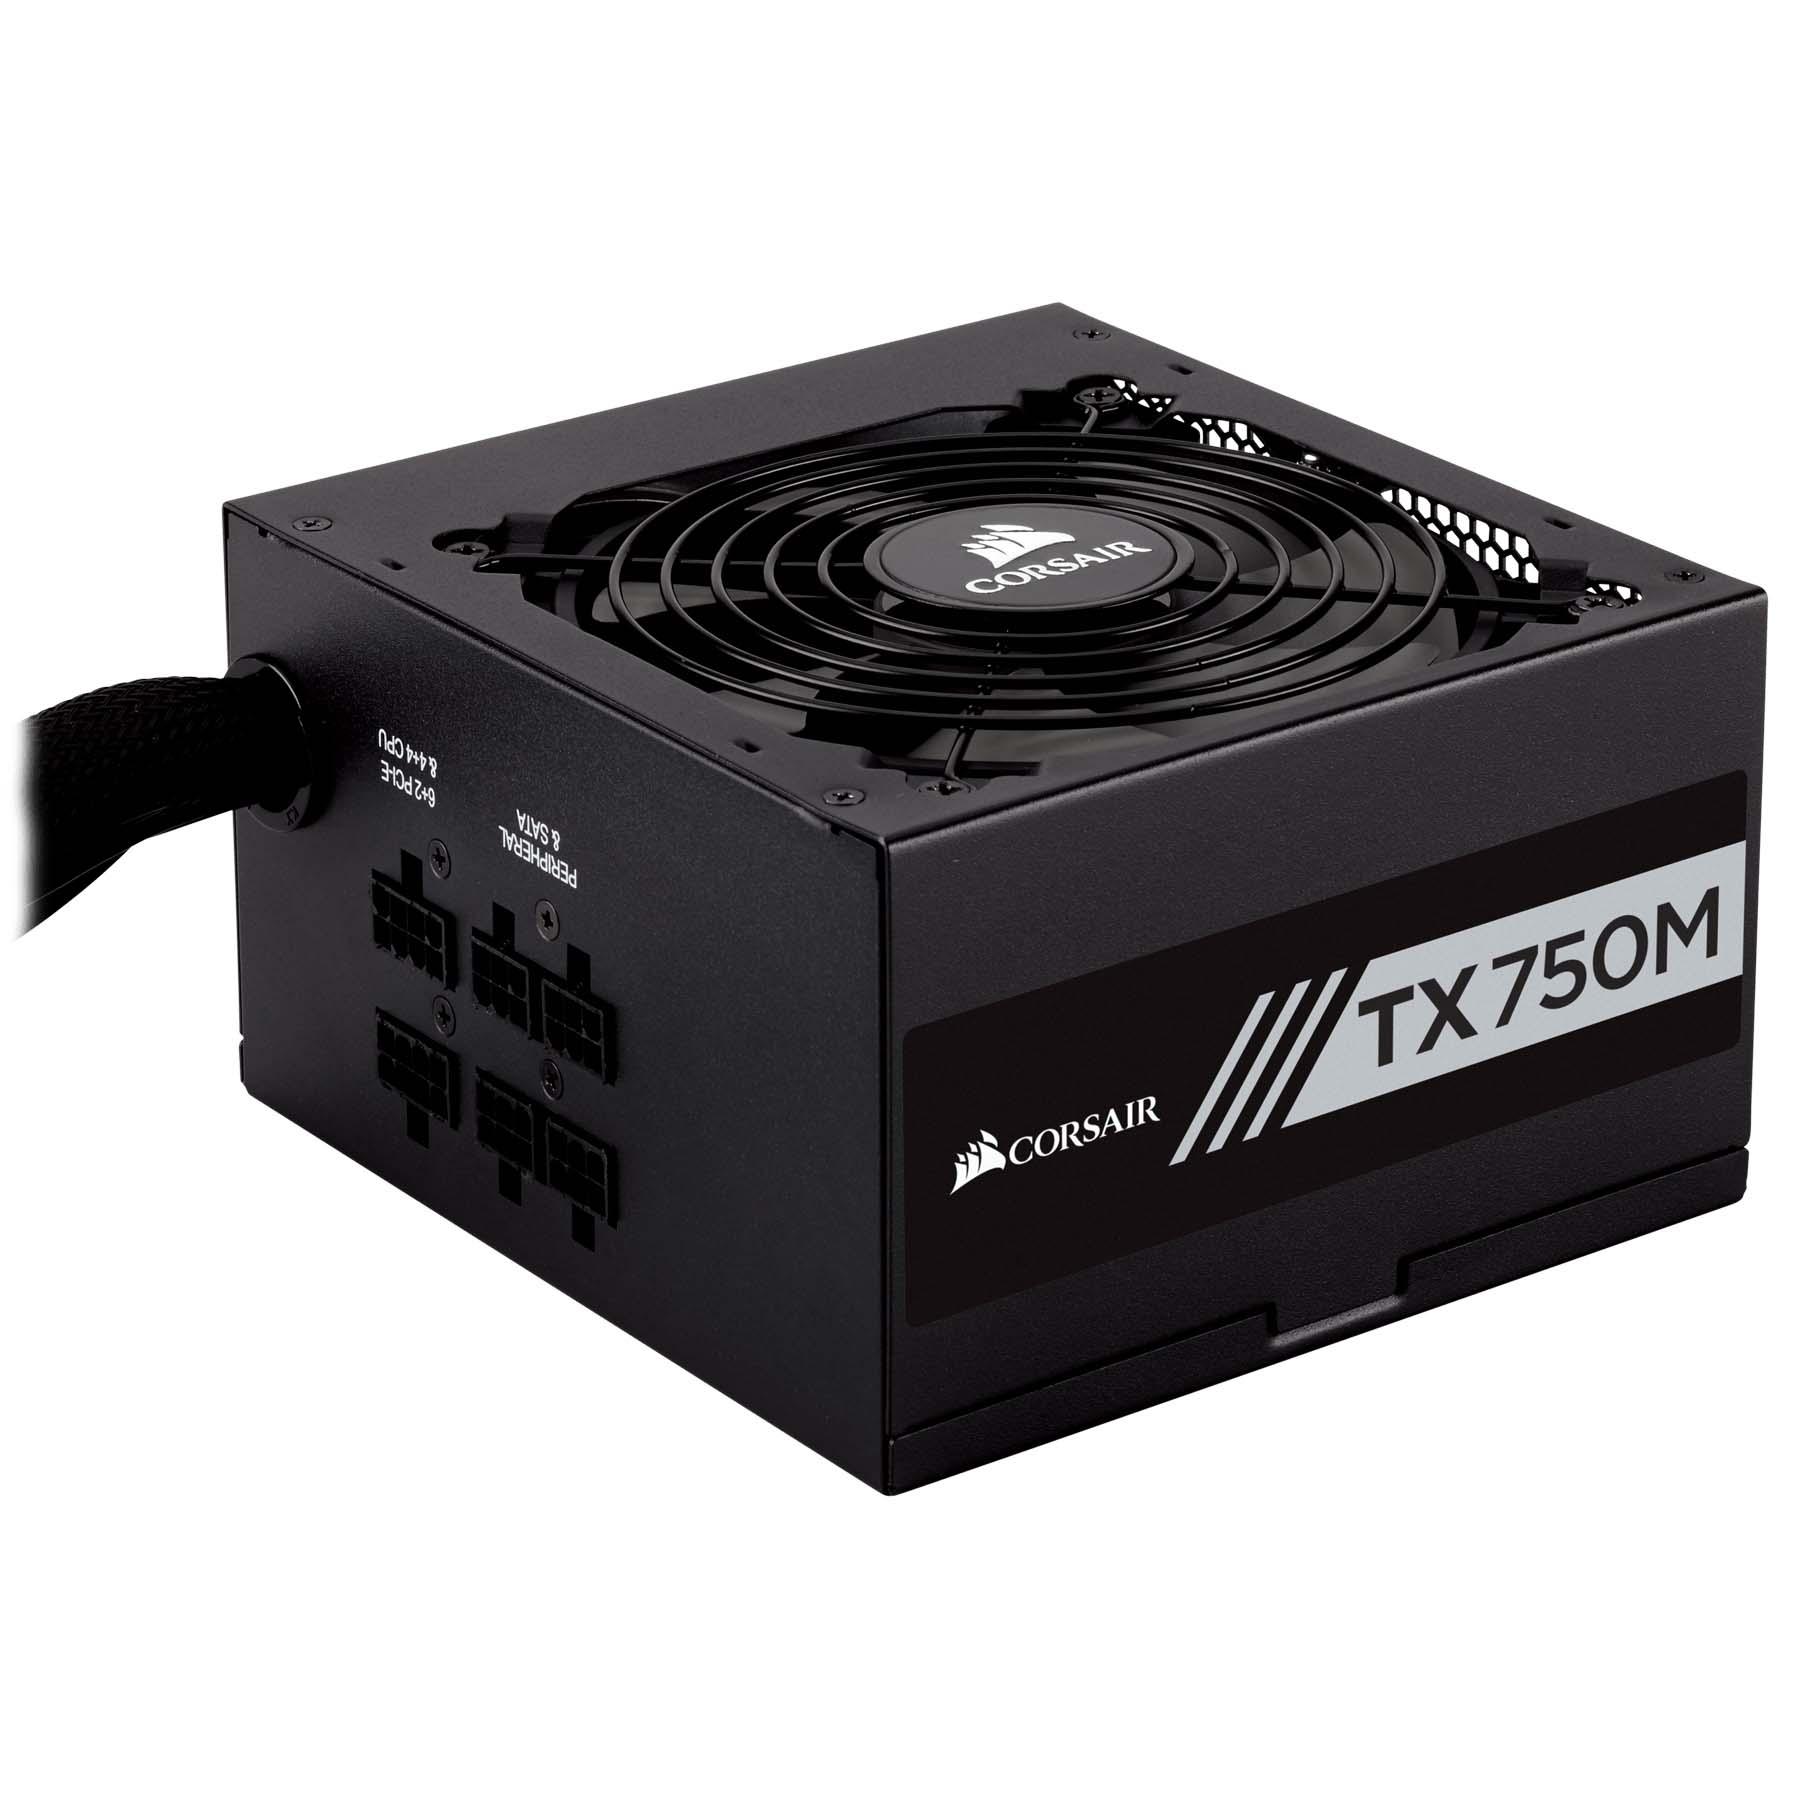 POWER SUPPLY CORSAIR TX750M-750 WATT 80 PLUS GOLD 24PIN LGA PSU ,Case & Power Supply